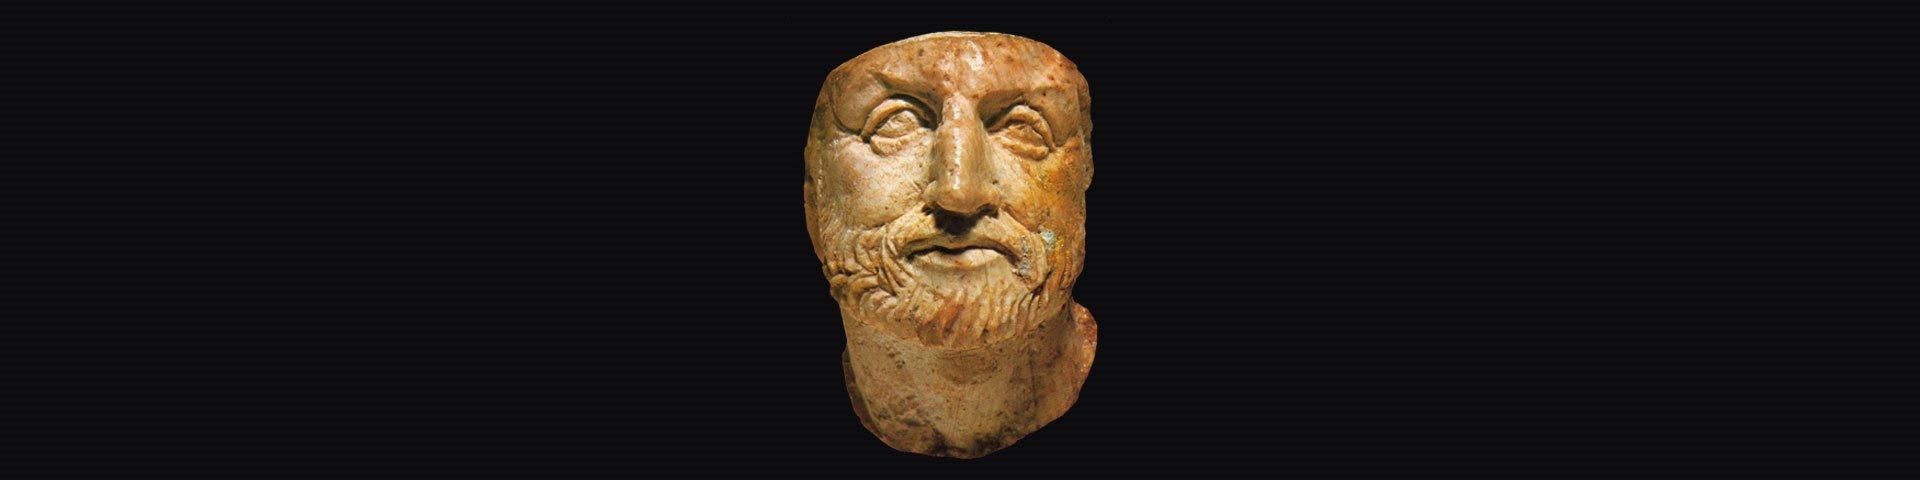 Philip II's Macedon: The creation of an empire